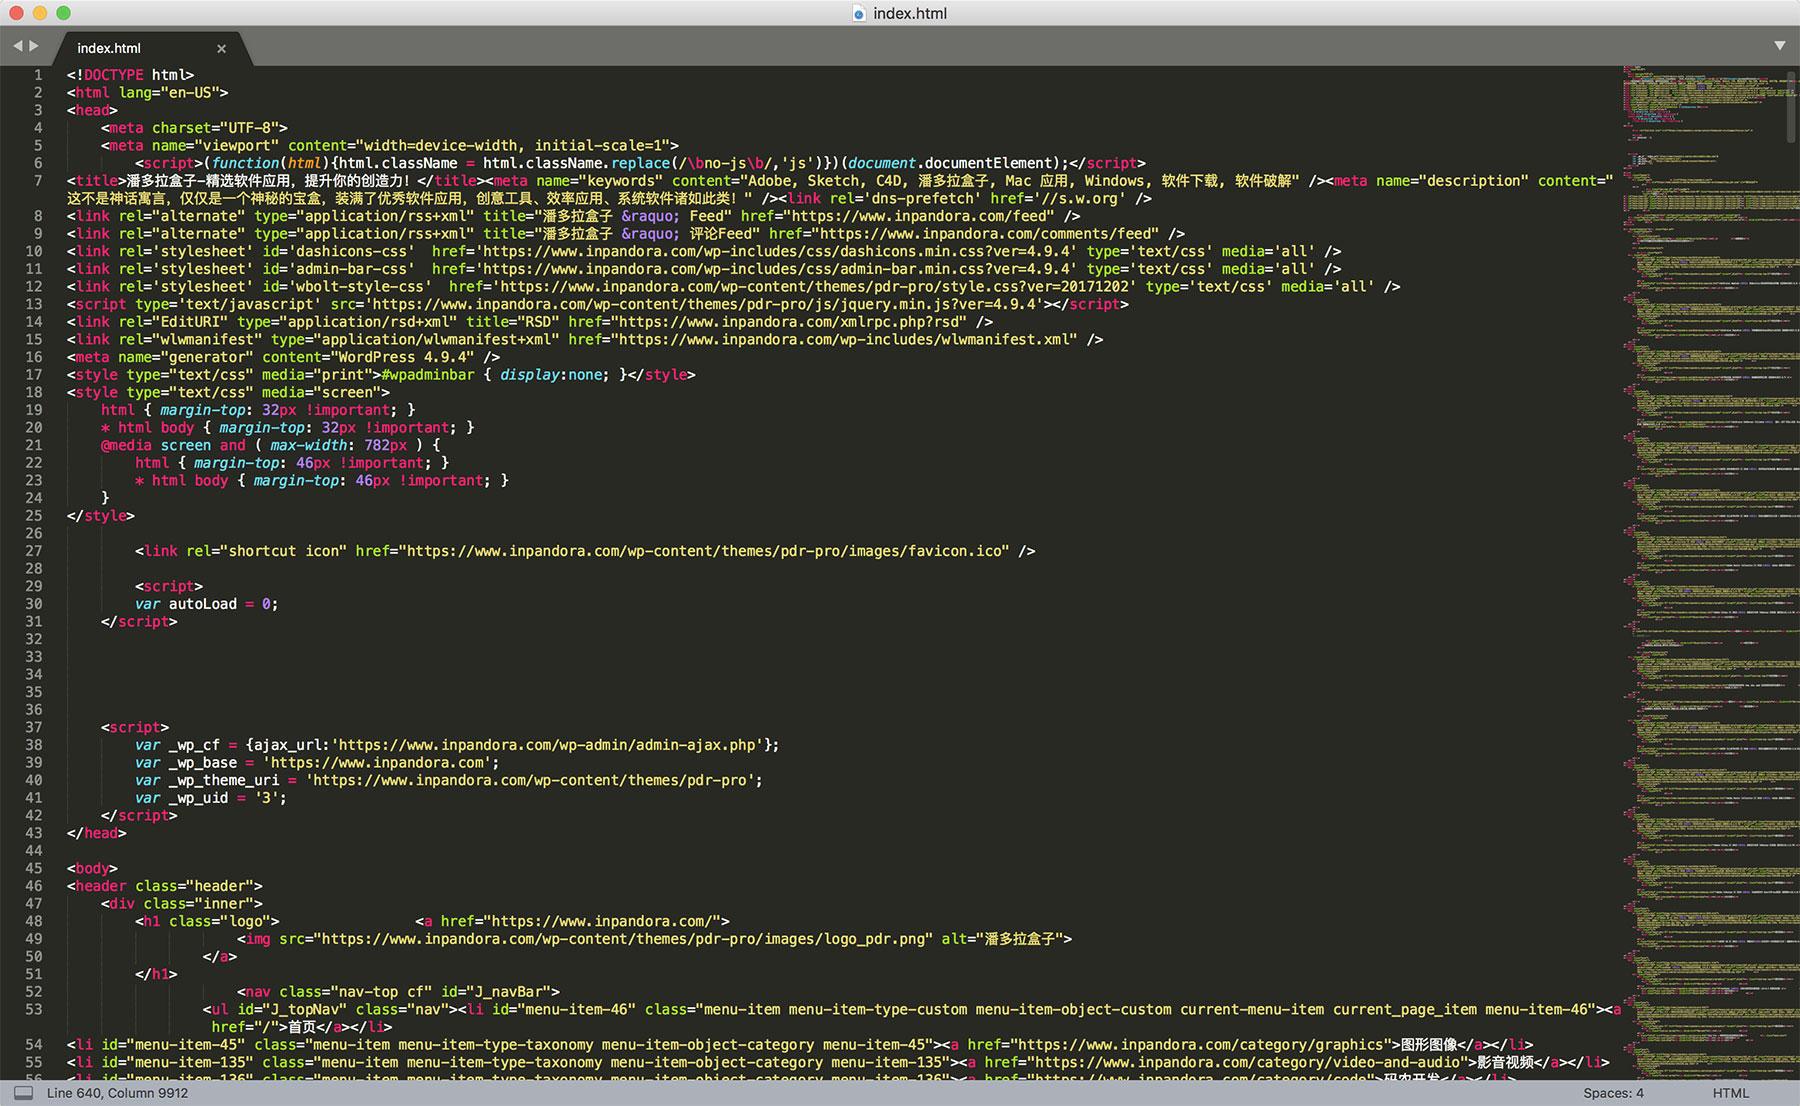 Sublime Text Build 3157 - 酷炫高效的MAC编码必备神器